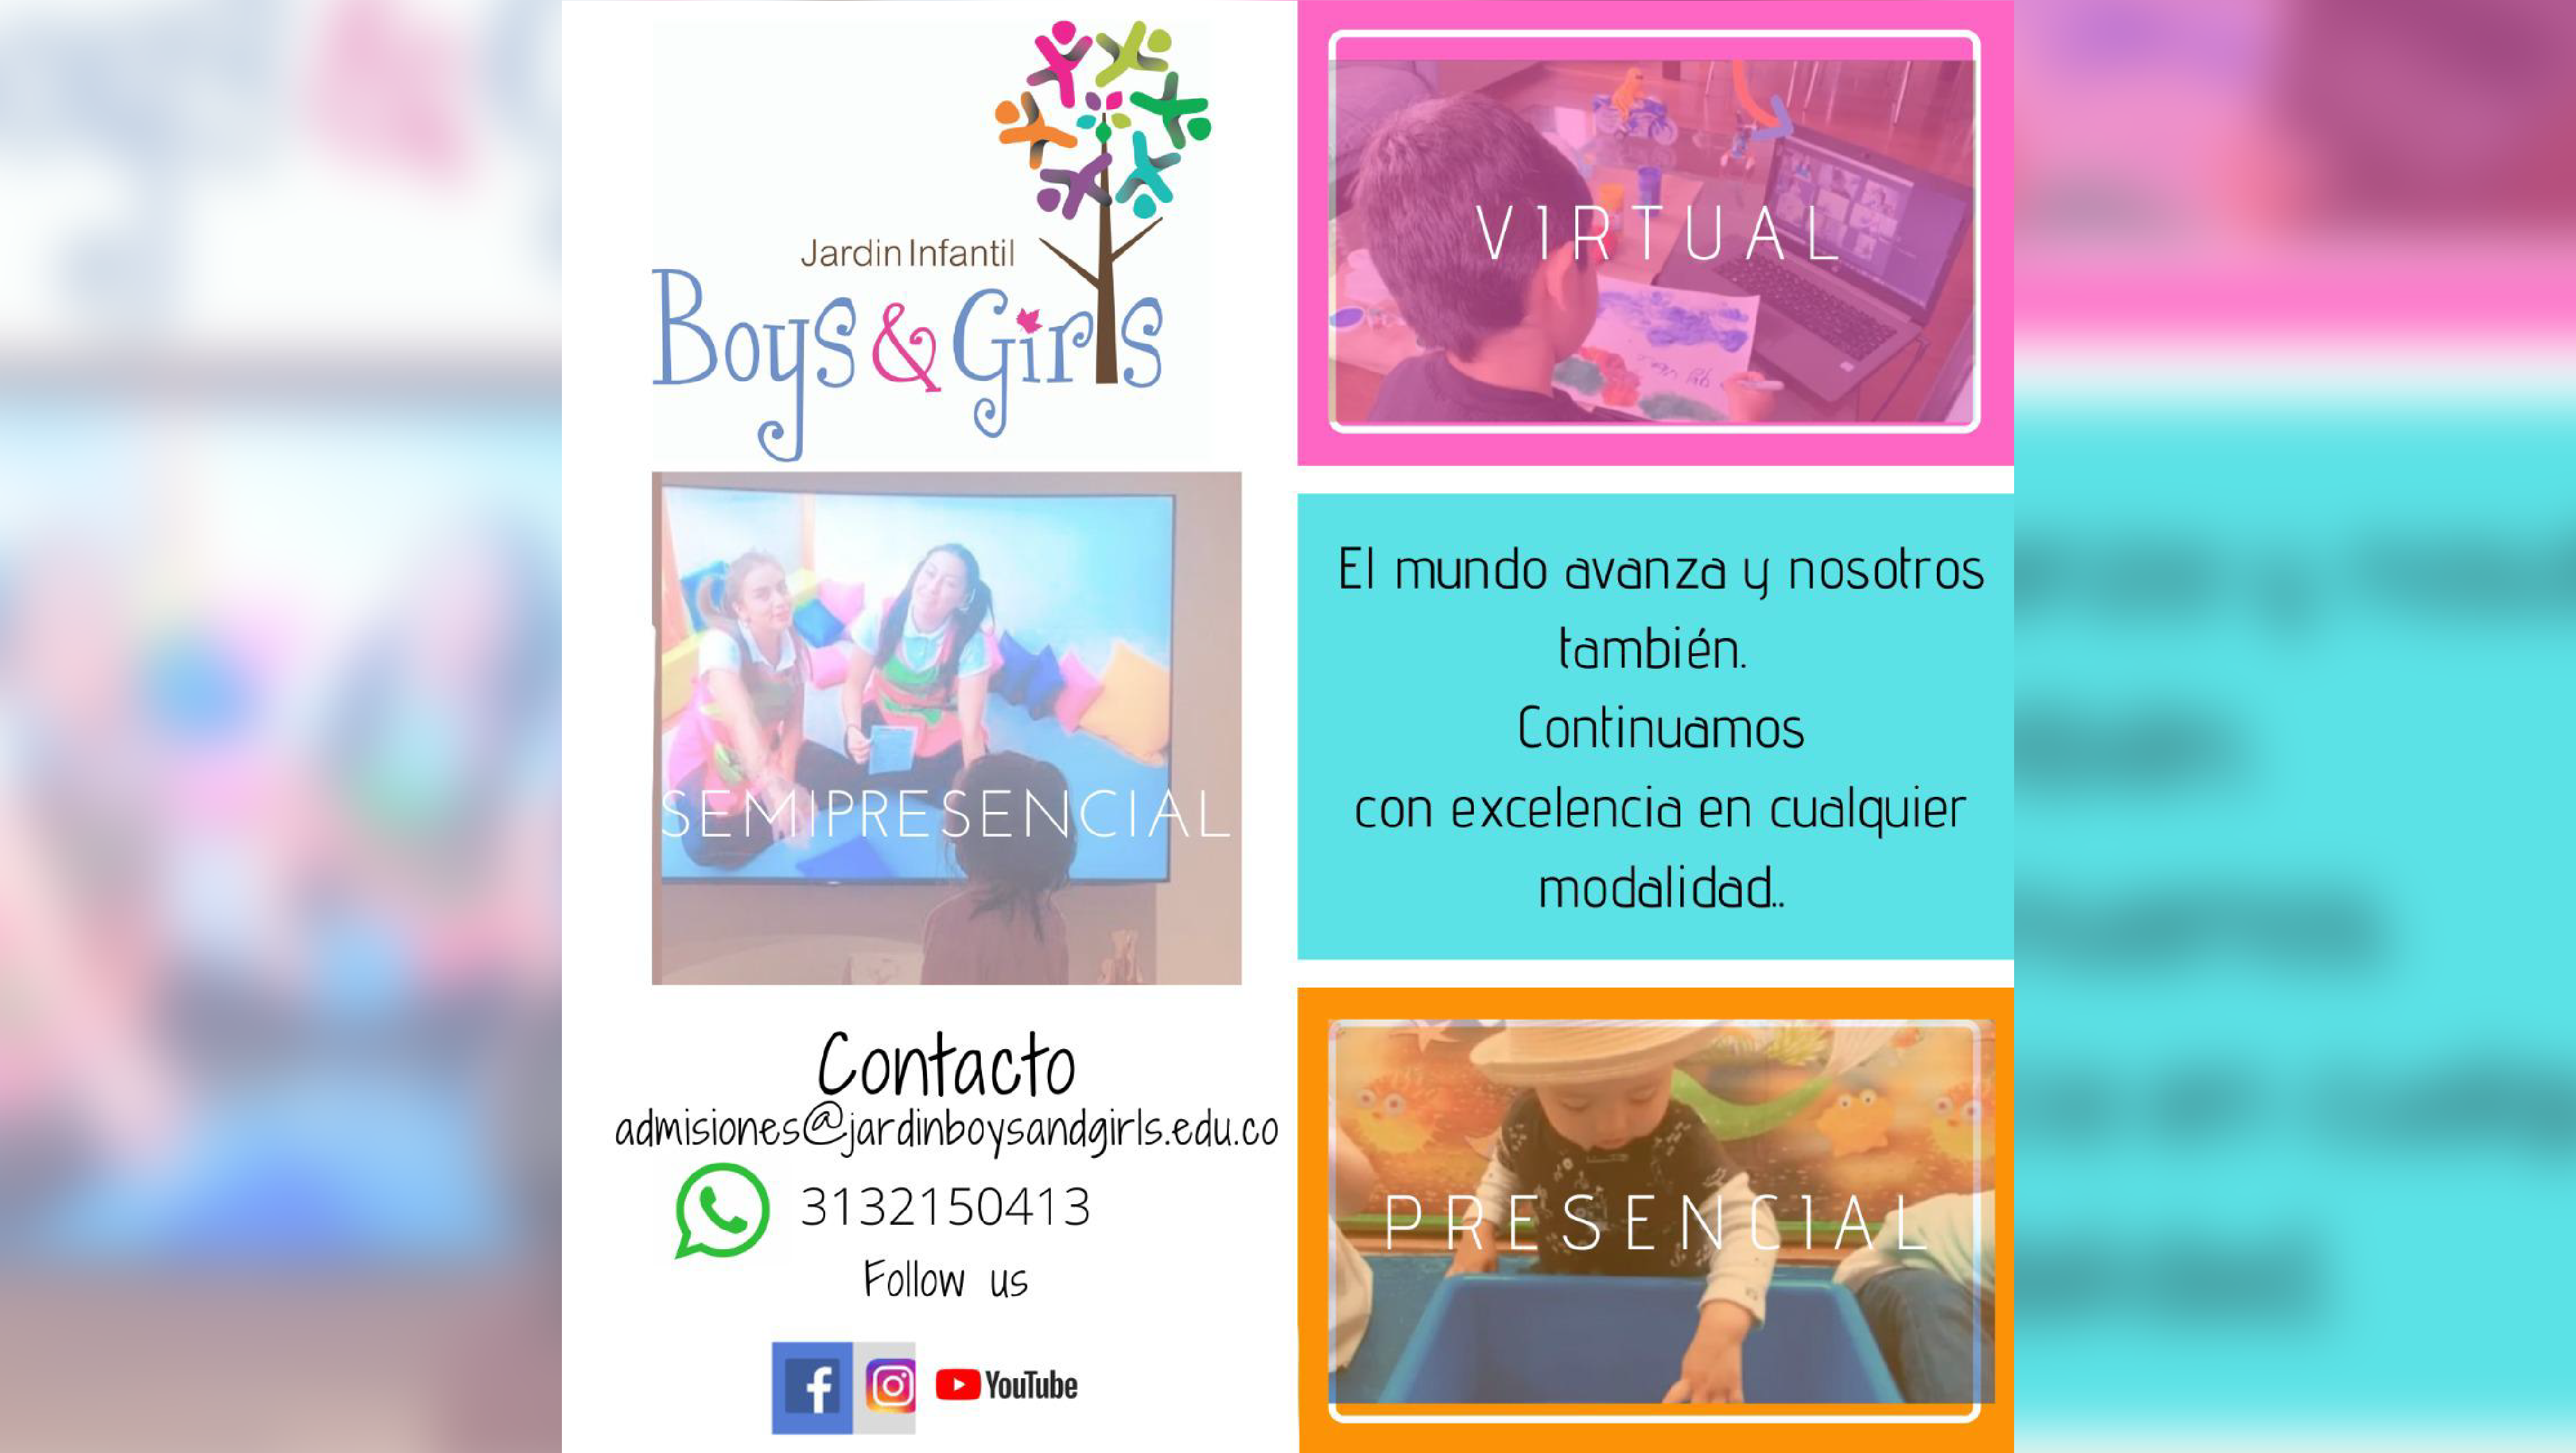 jardin-infantil-boys-and-girls-bogota-virtualidad-01